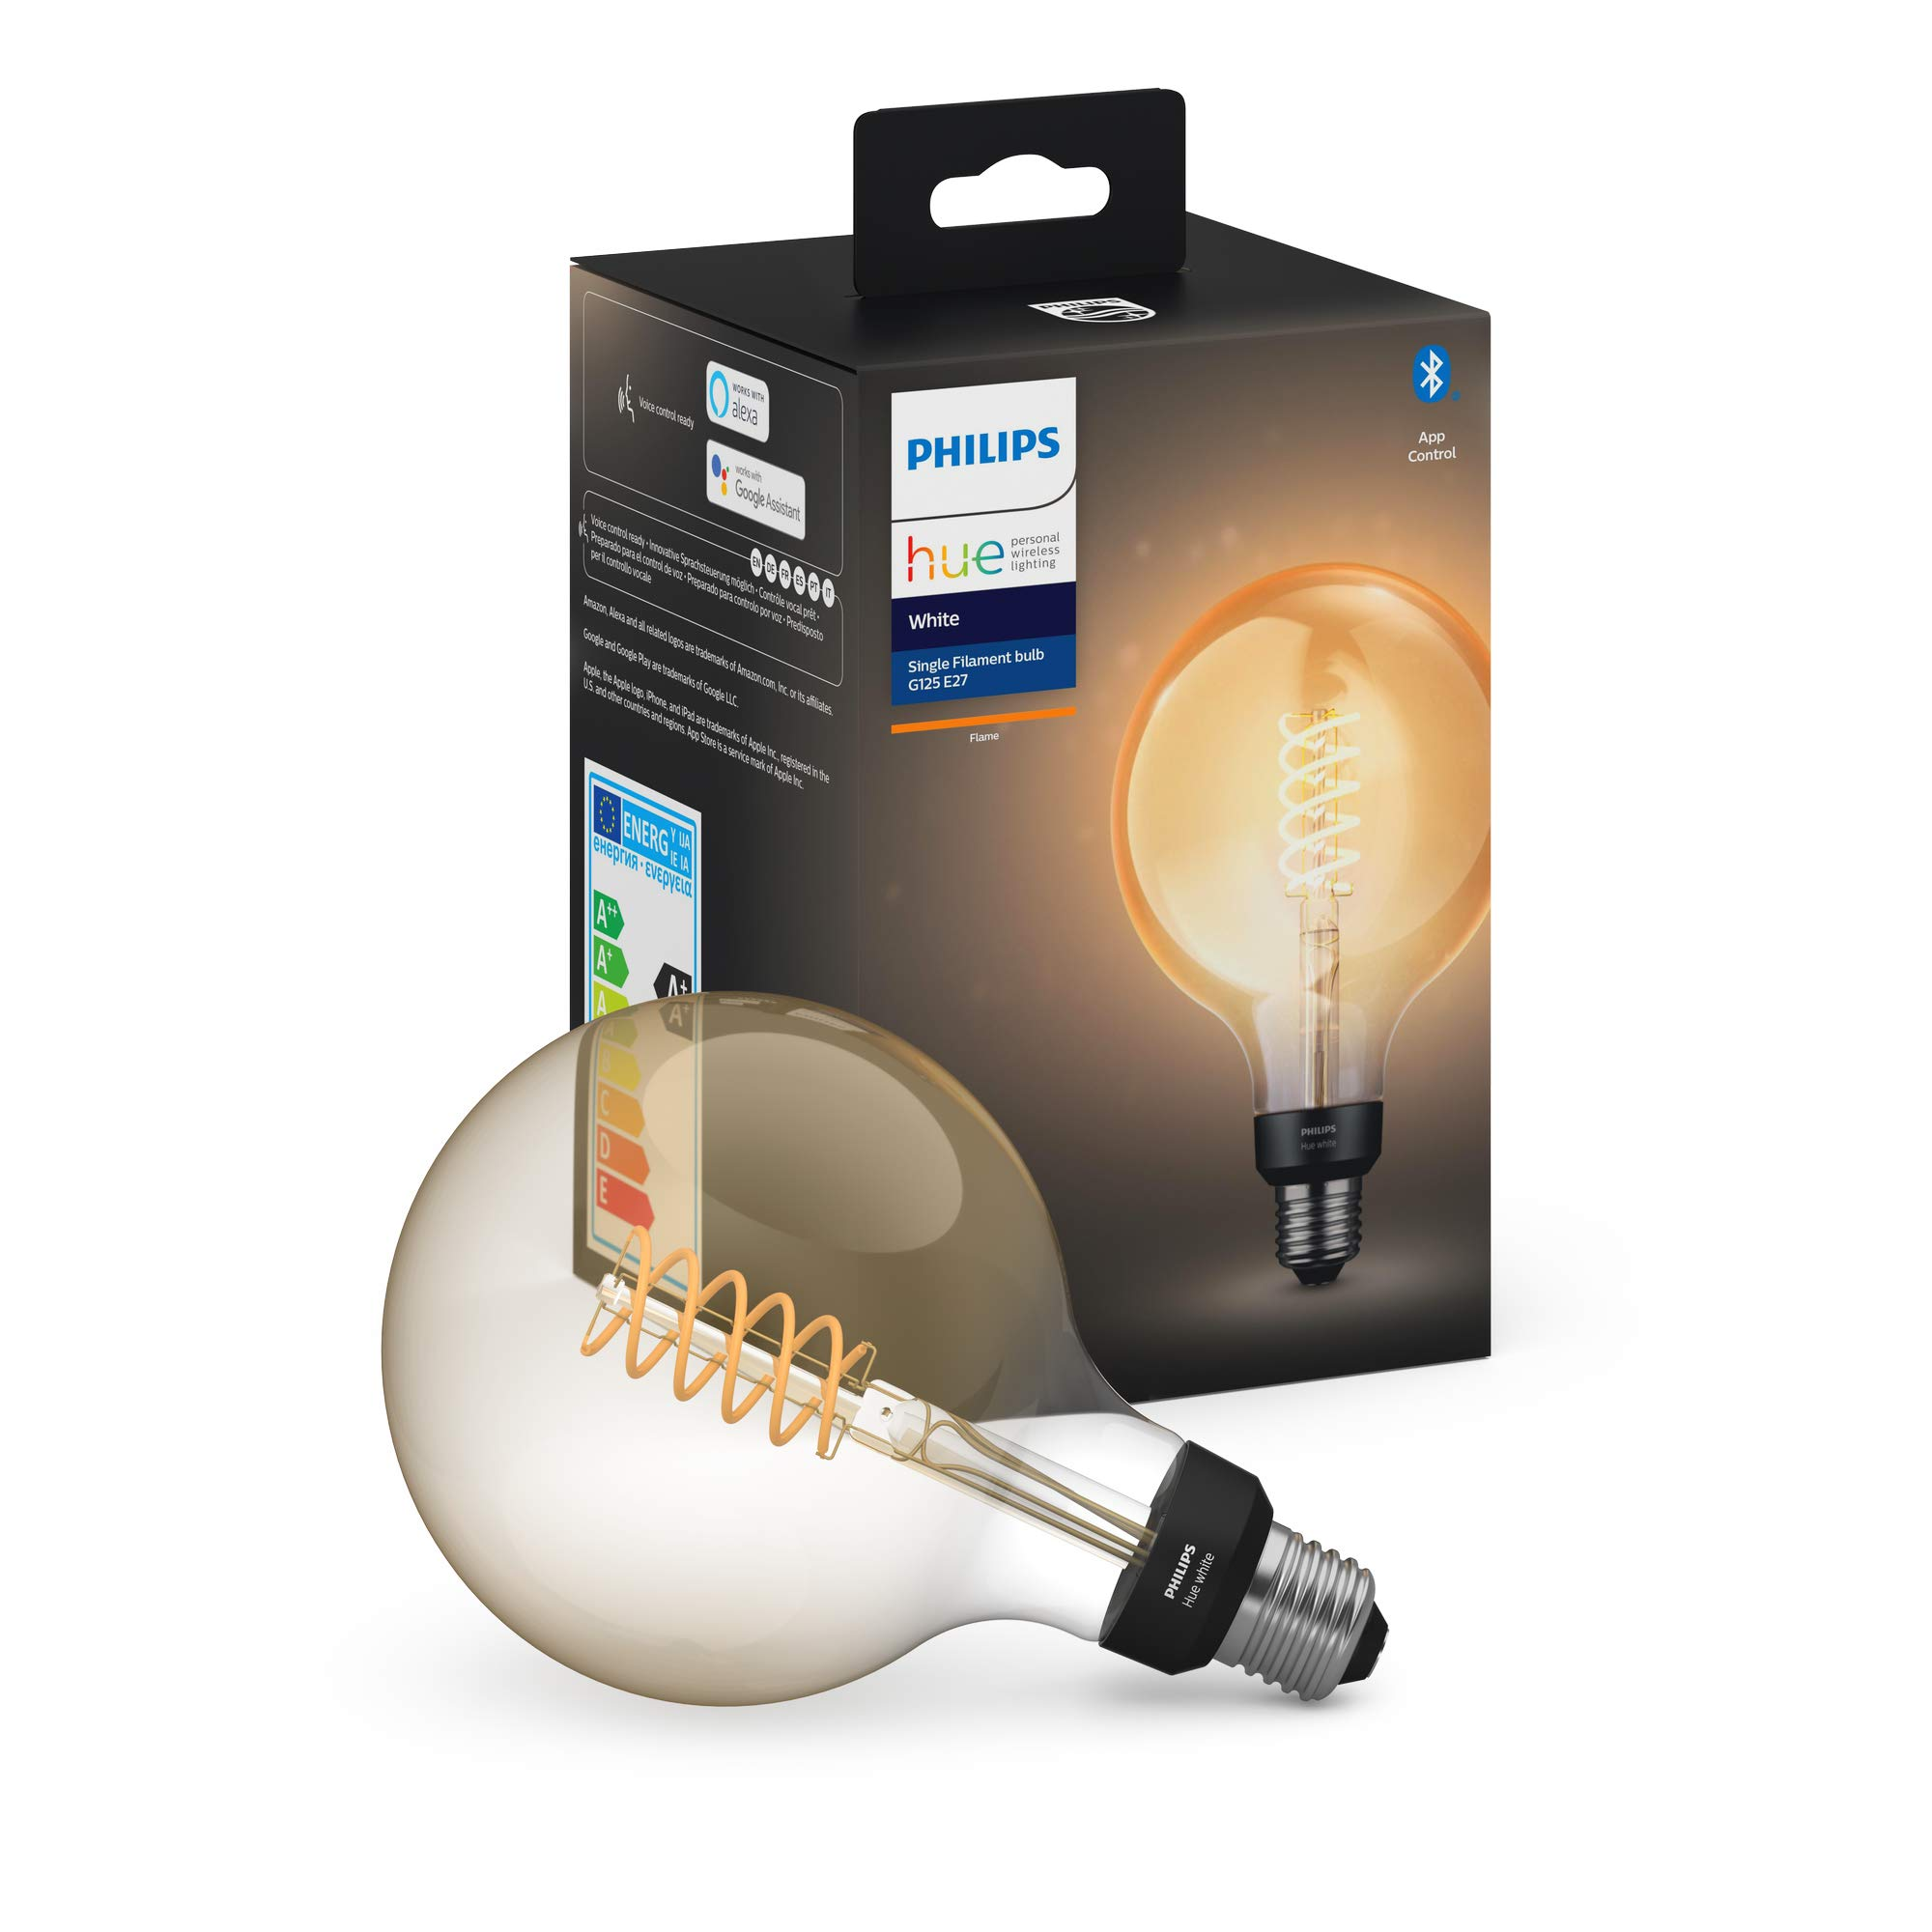 Philips Hue Bombilla Inteligente LED E27, 7W, forma globo, con Bluetooth, Filamento, Luz Blanca Cálida, Compatible con Alexa y Google Home